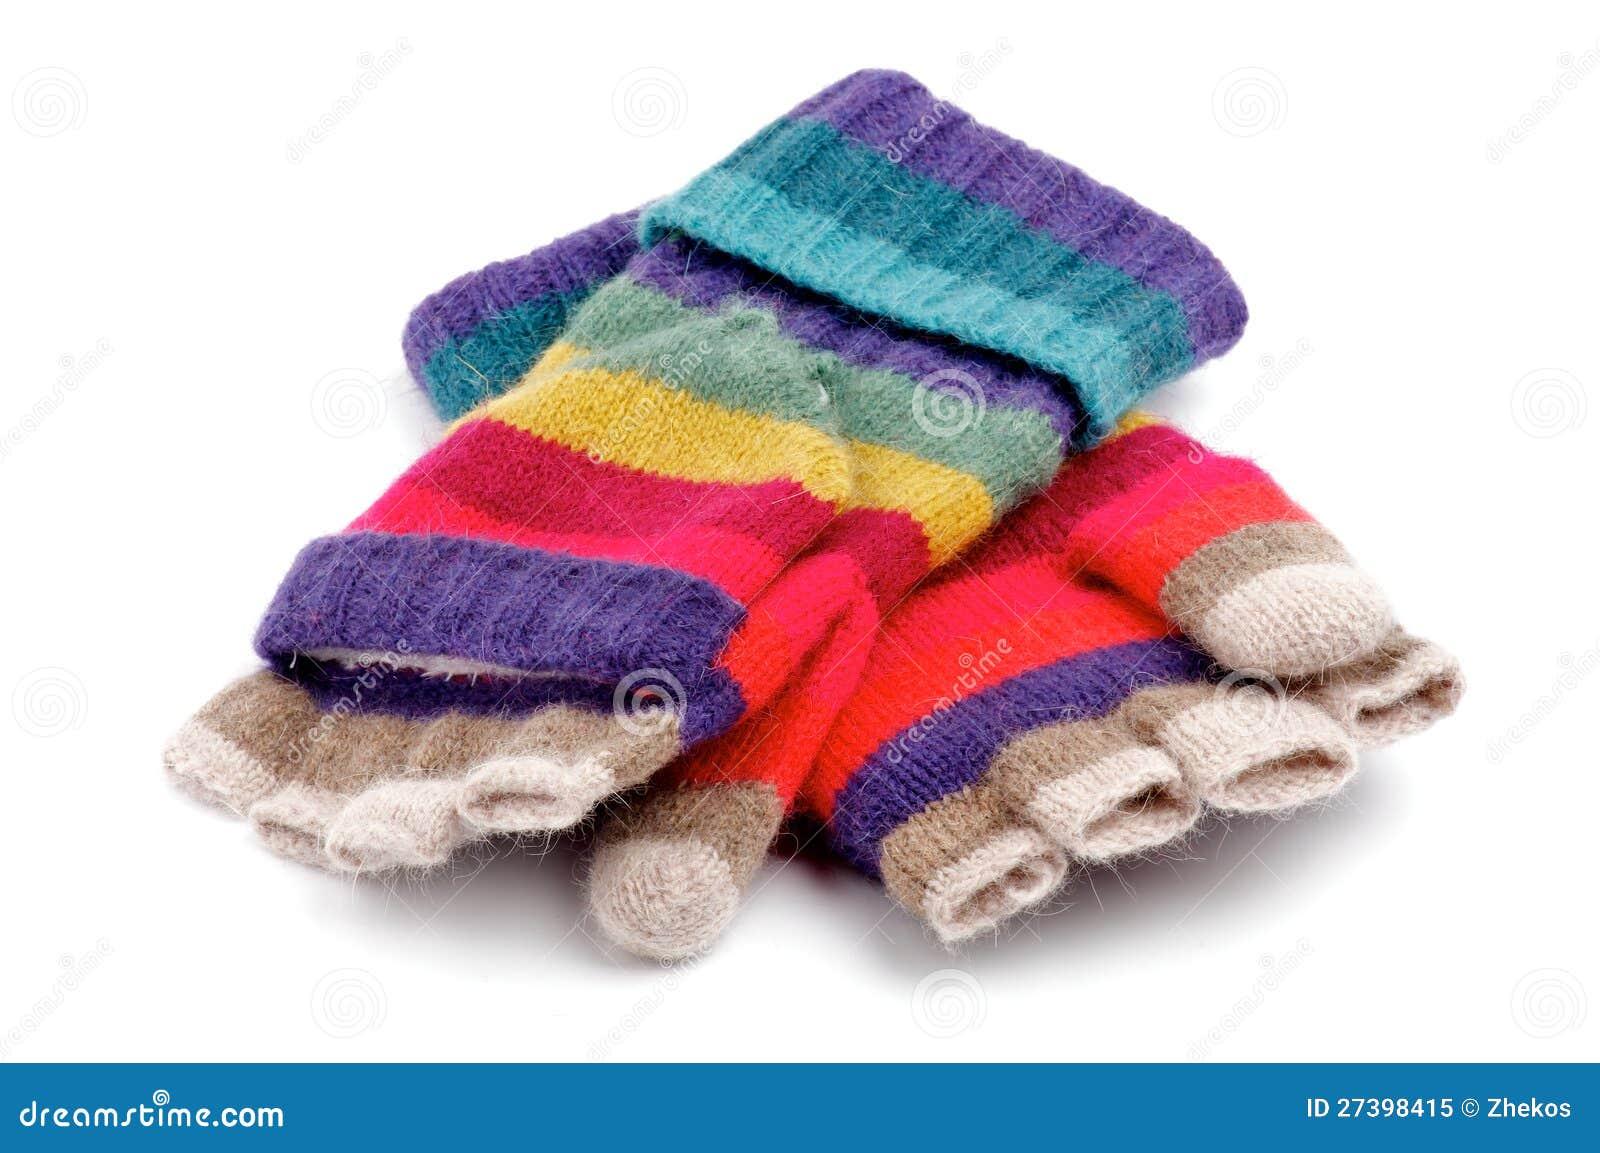 regenbogen gestreifte handschuhe mit den fingern lizenzfreies stockfoto bild 27398415. Black Bedroom Furniture Sets. Home Design Ideas